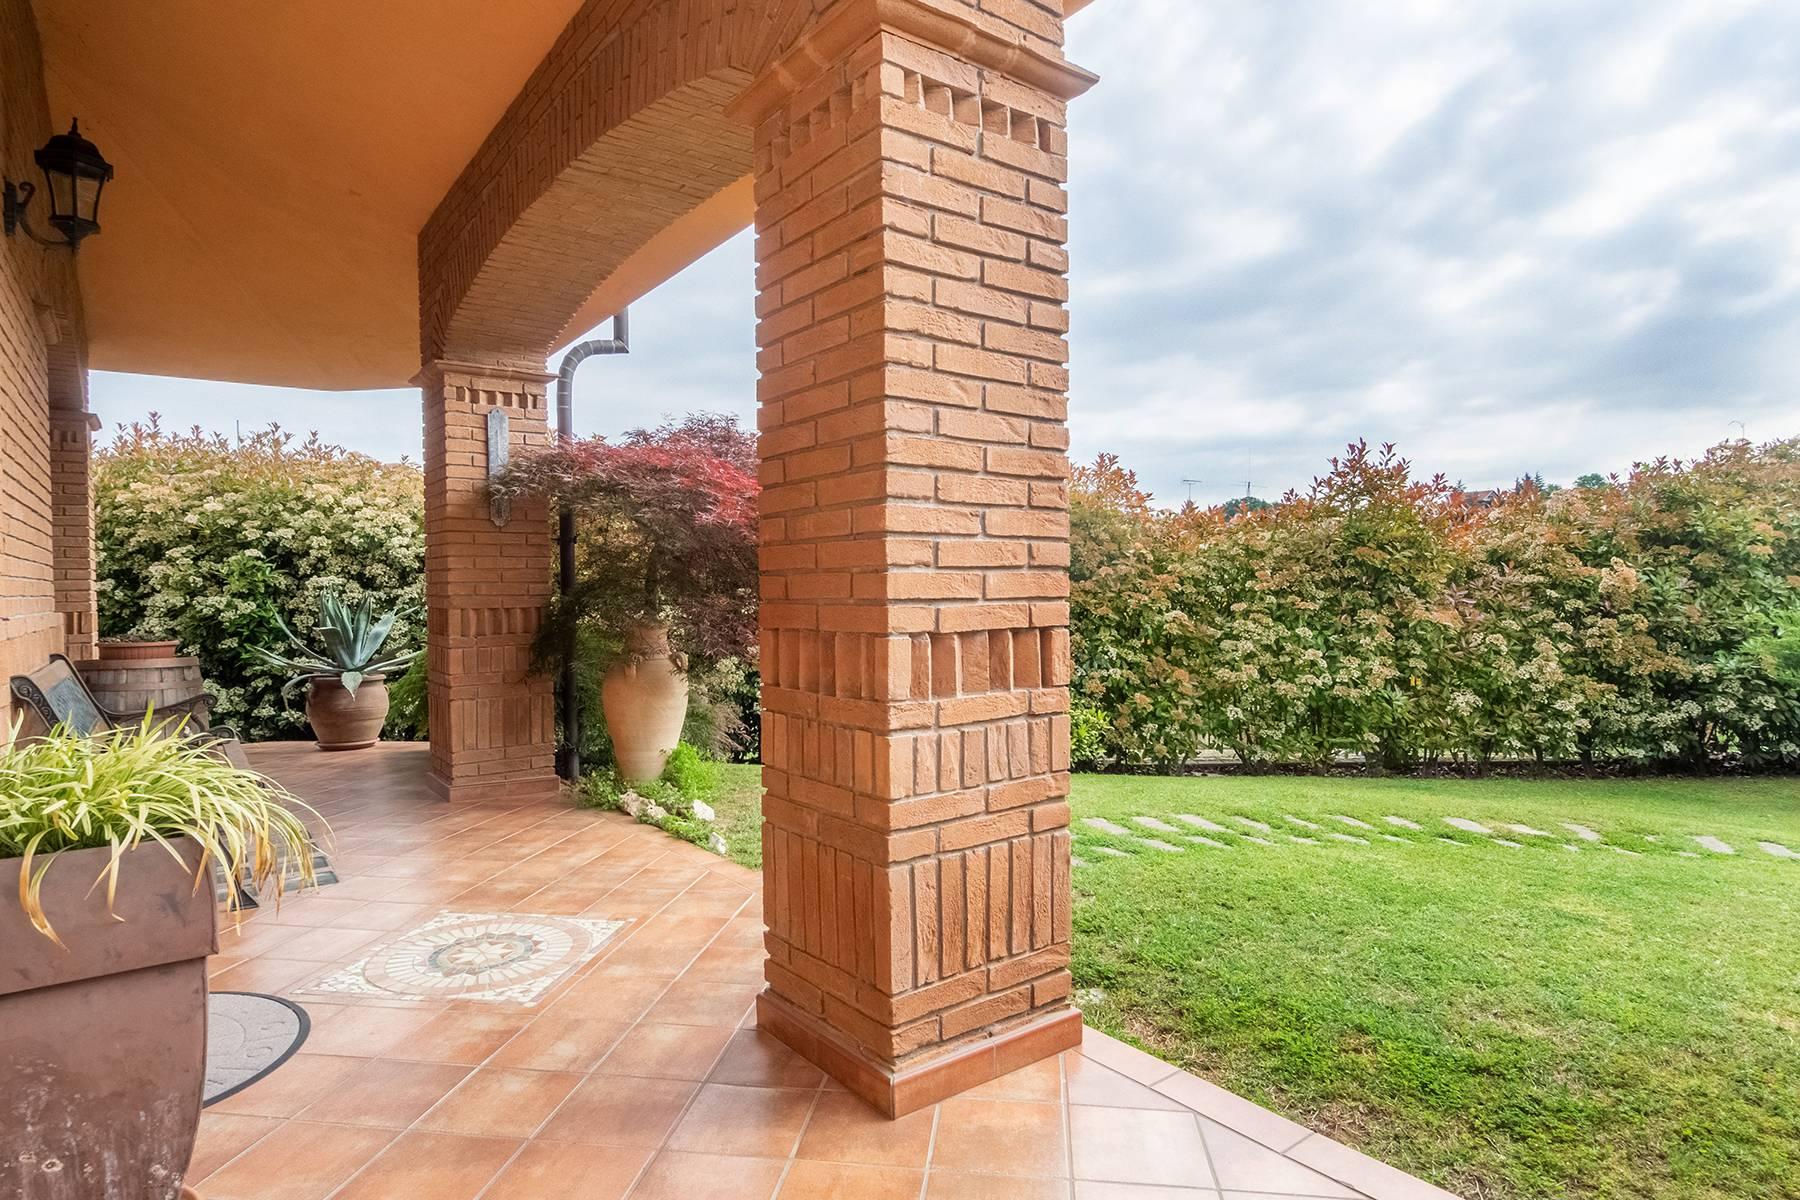 Villa in Vendita a Rosta: 5 locali, 182 mq - Foto 6